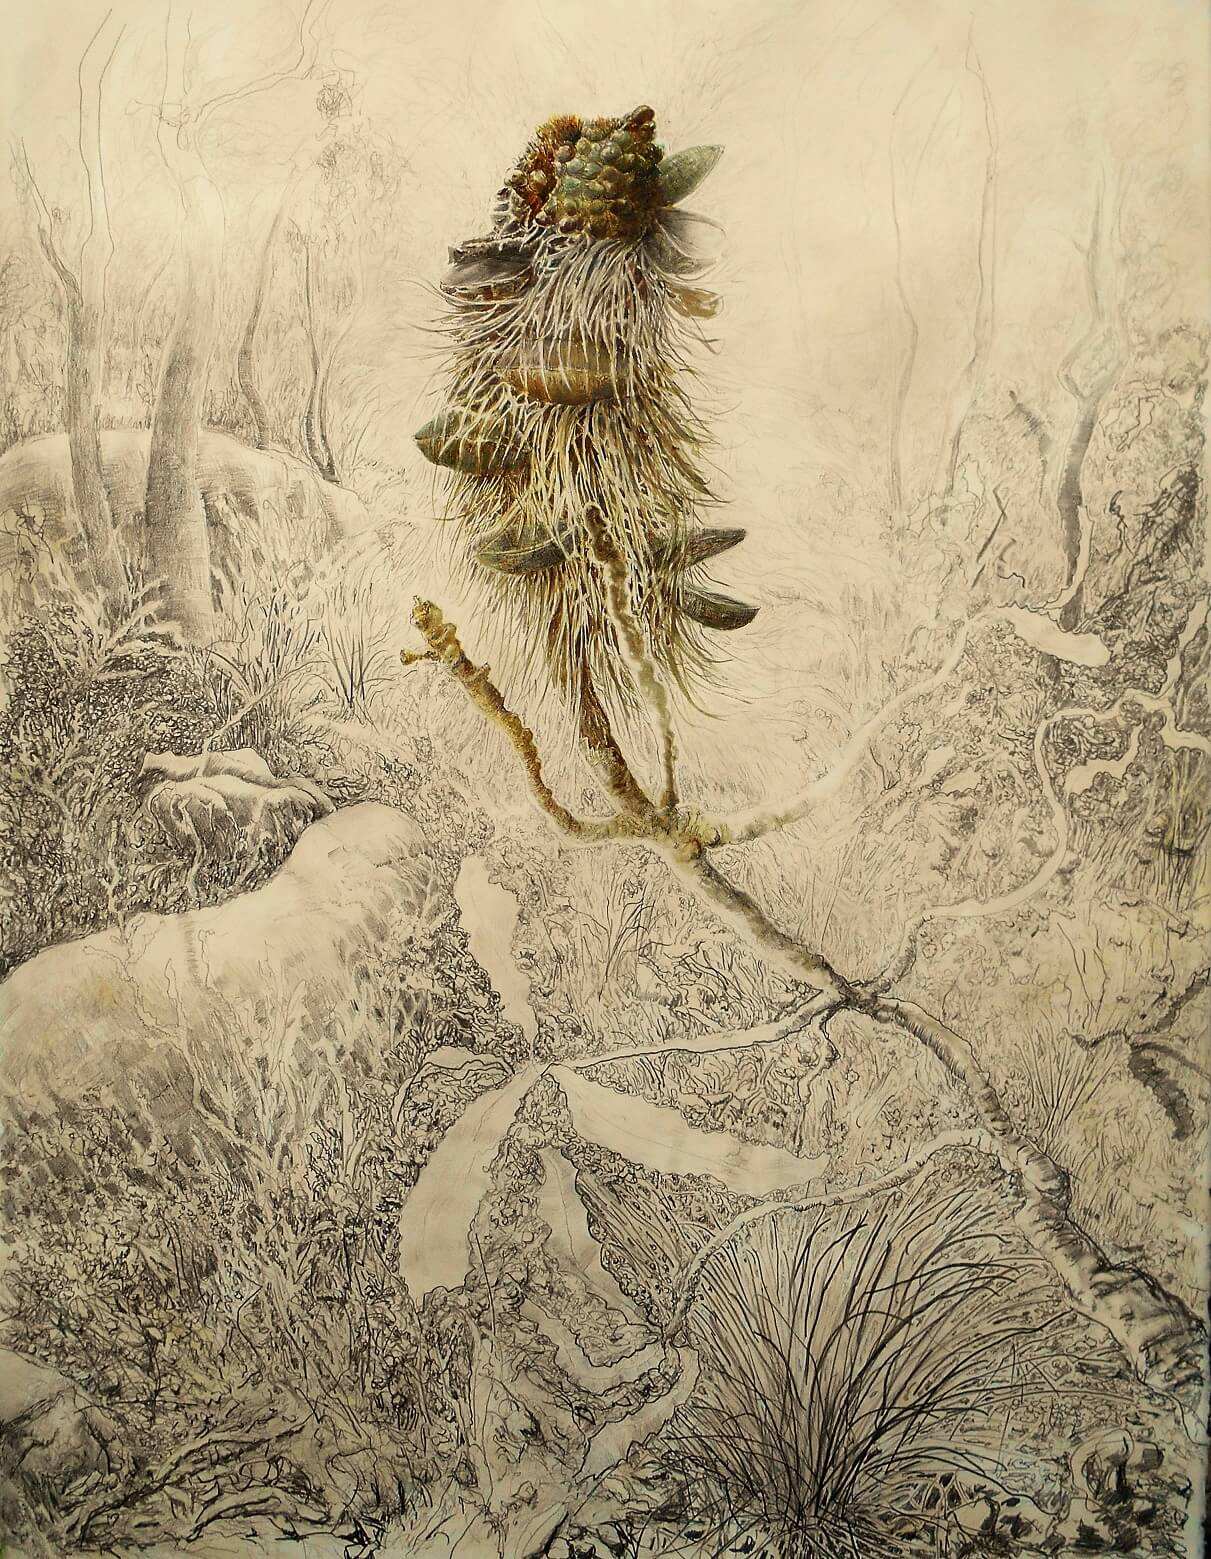 patric-shirvington-banksia-serrata-2-75-x-56-cm-oco-pencilwatercolour-on-arches-paper-2500